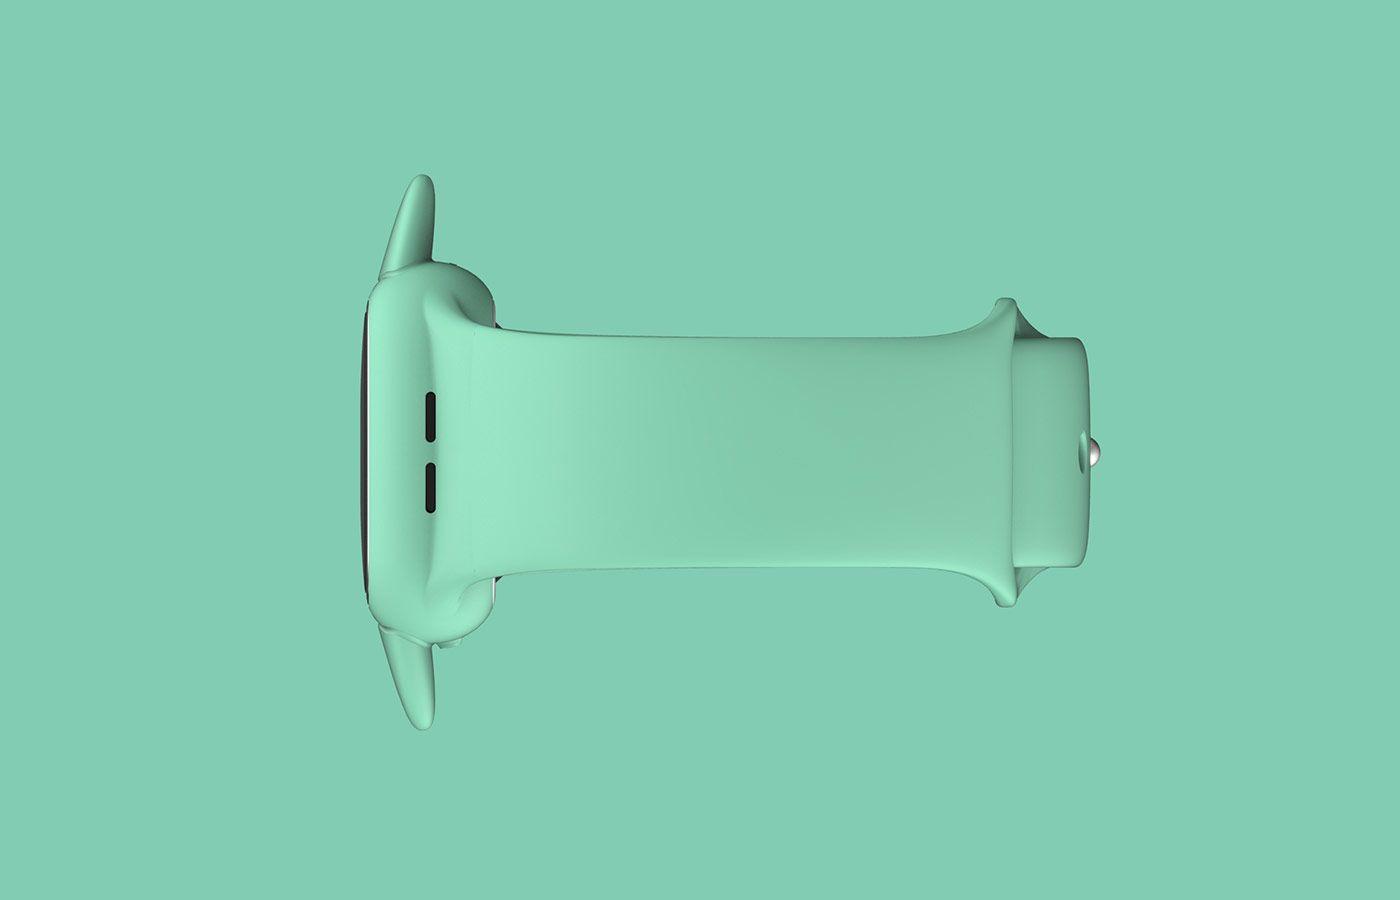 Smart watch industrial design,Smart watch product design